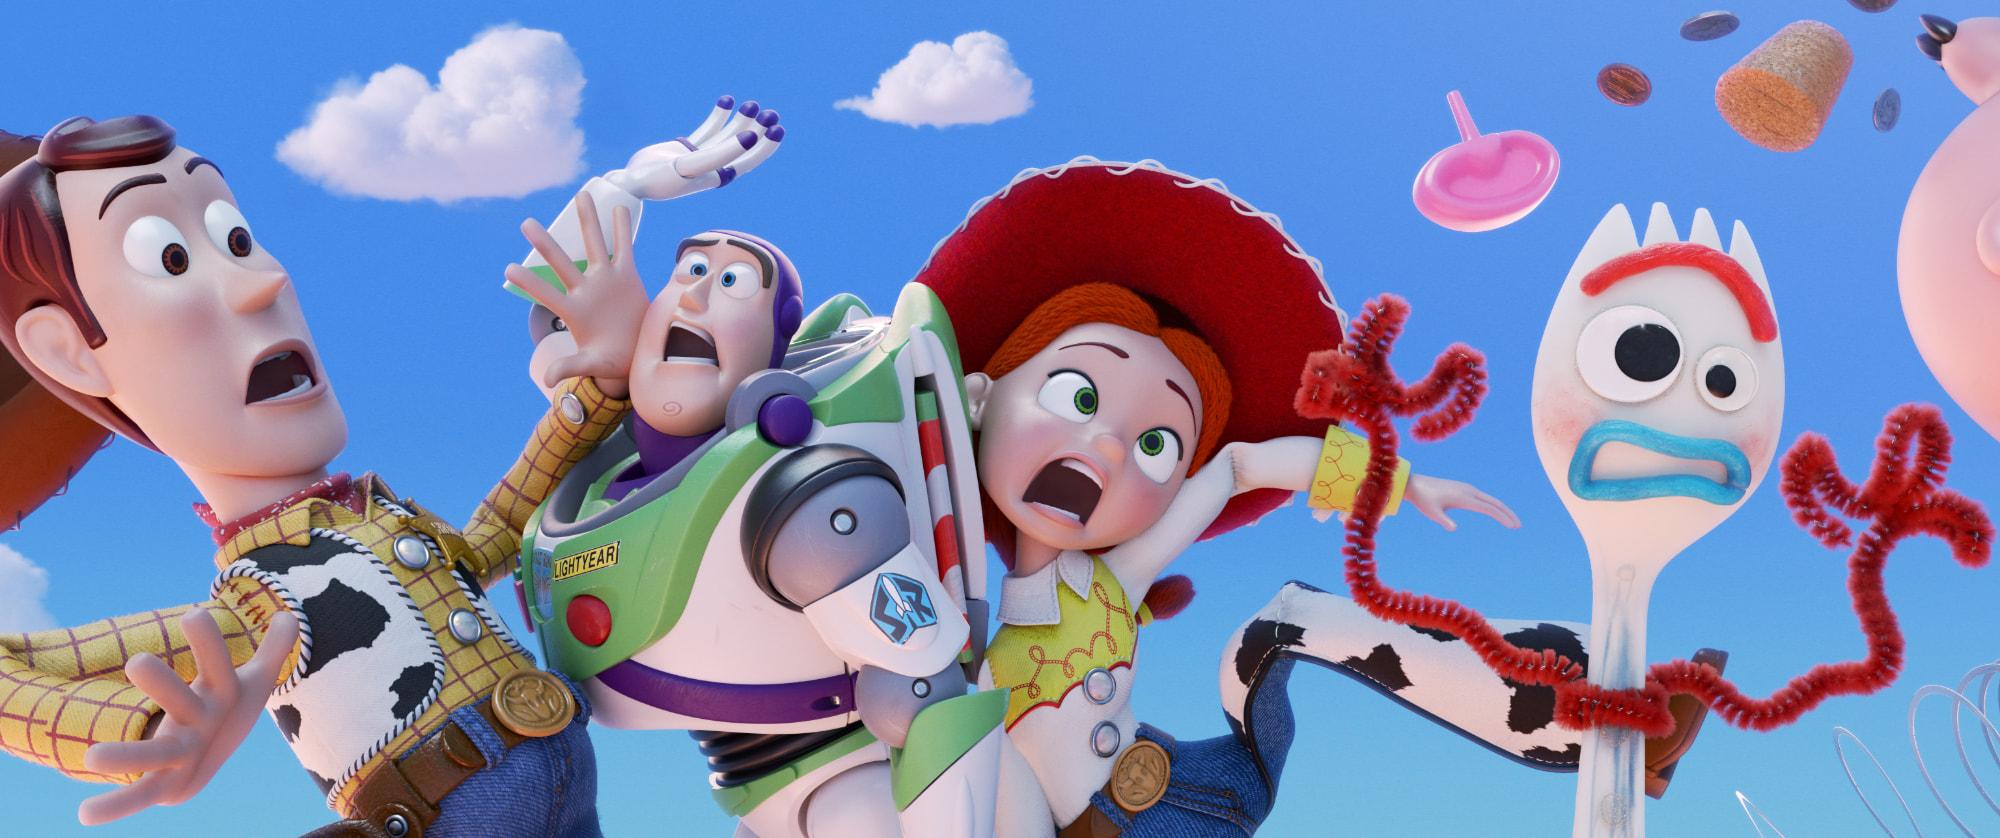 Toy Story 4: ecco i nuovi doppiatori italiani thumbnail